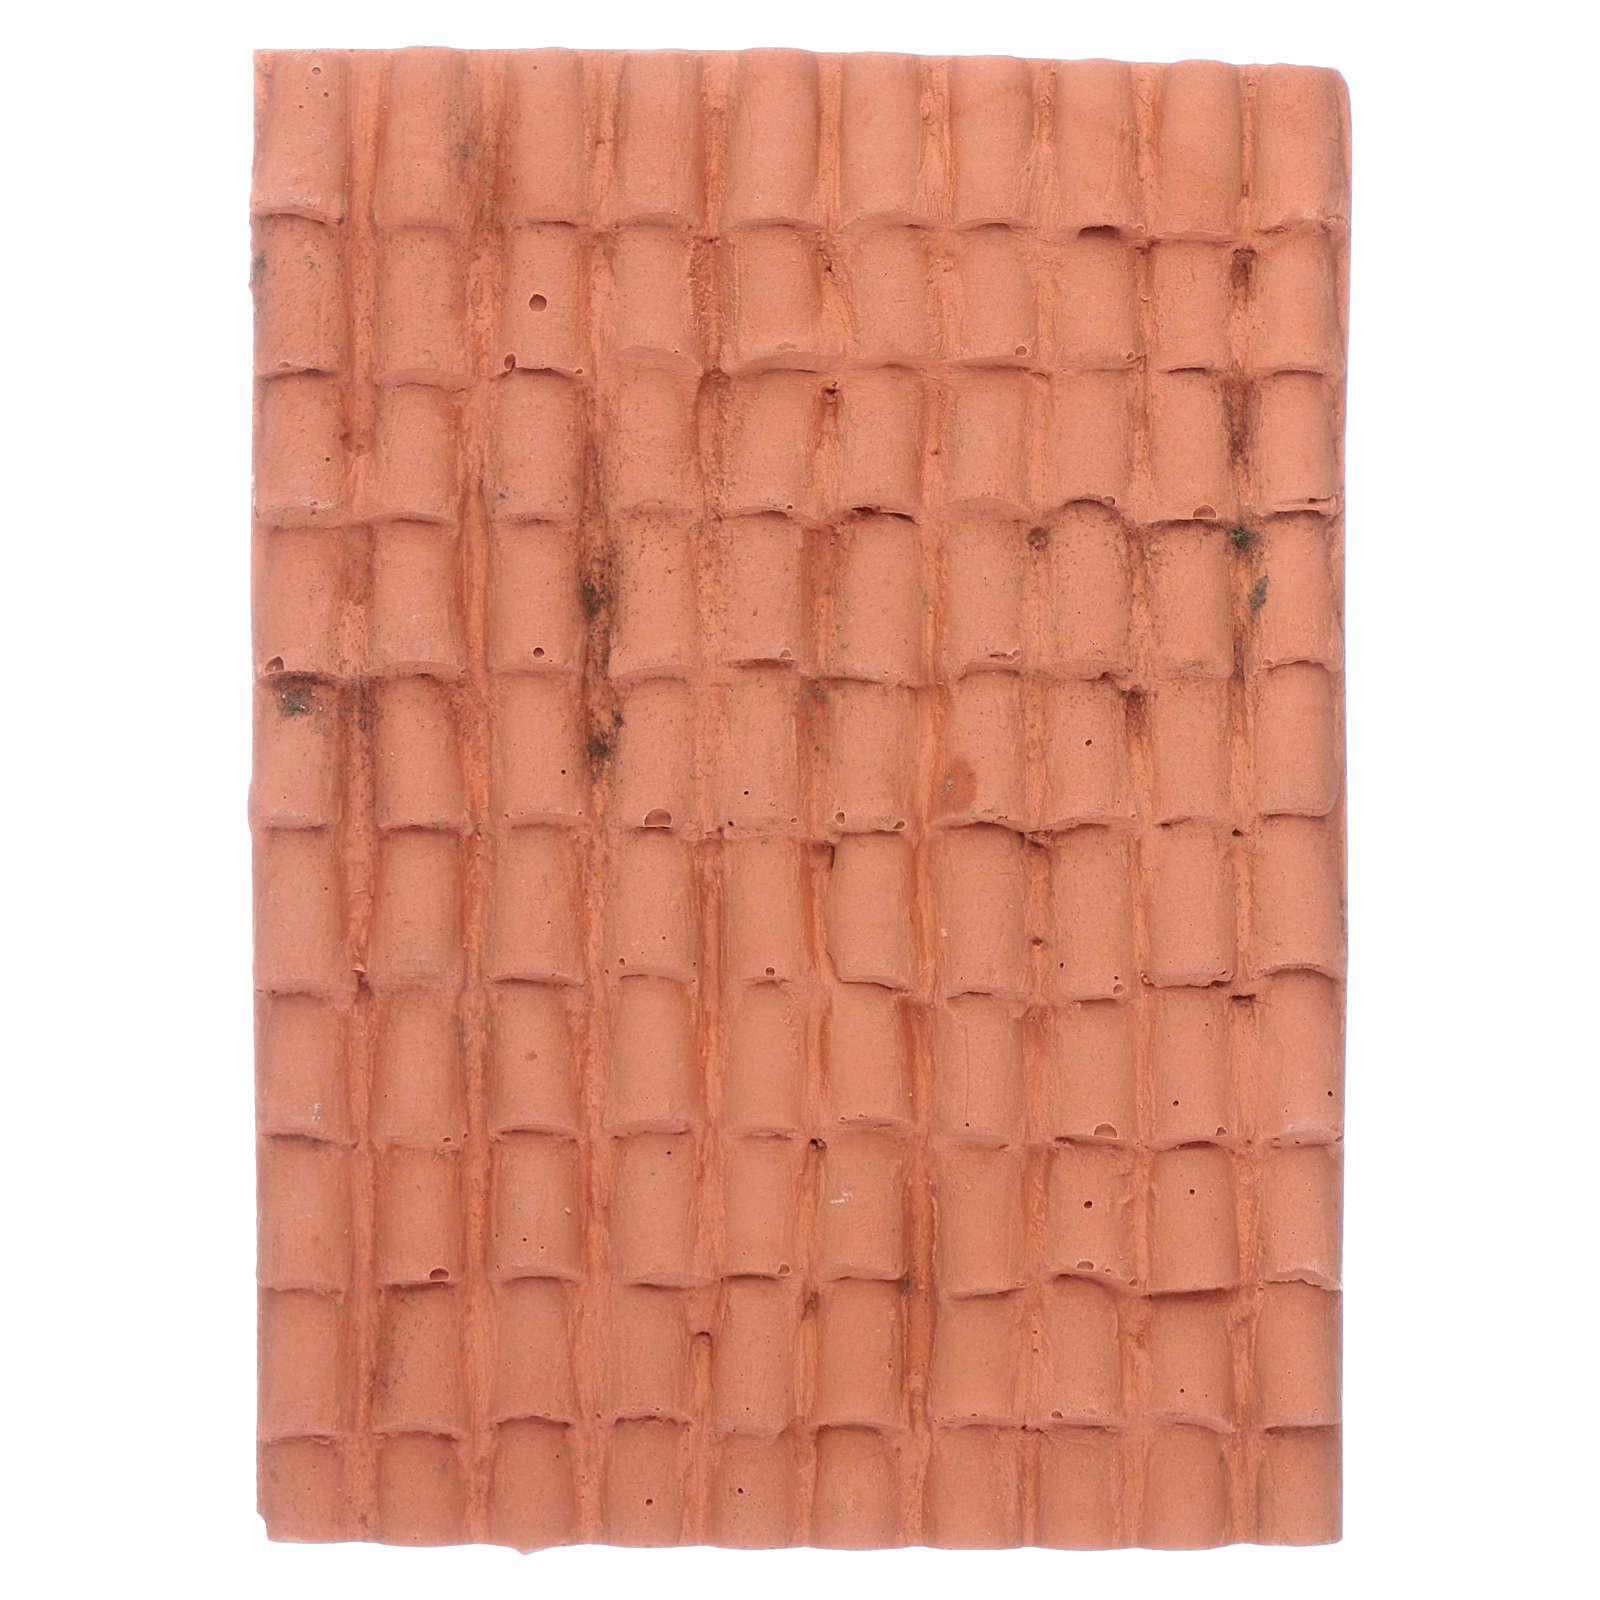 Accesorio techo con tejas de resina 10x5 cm 4